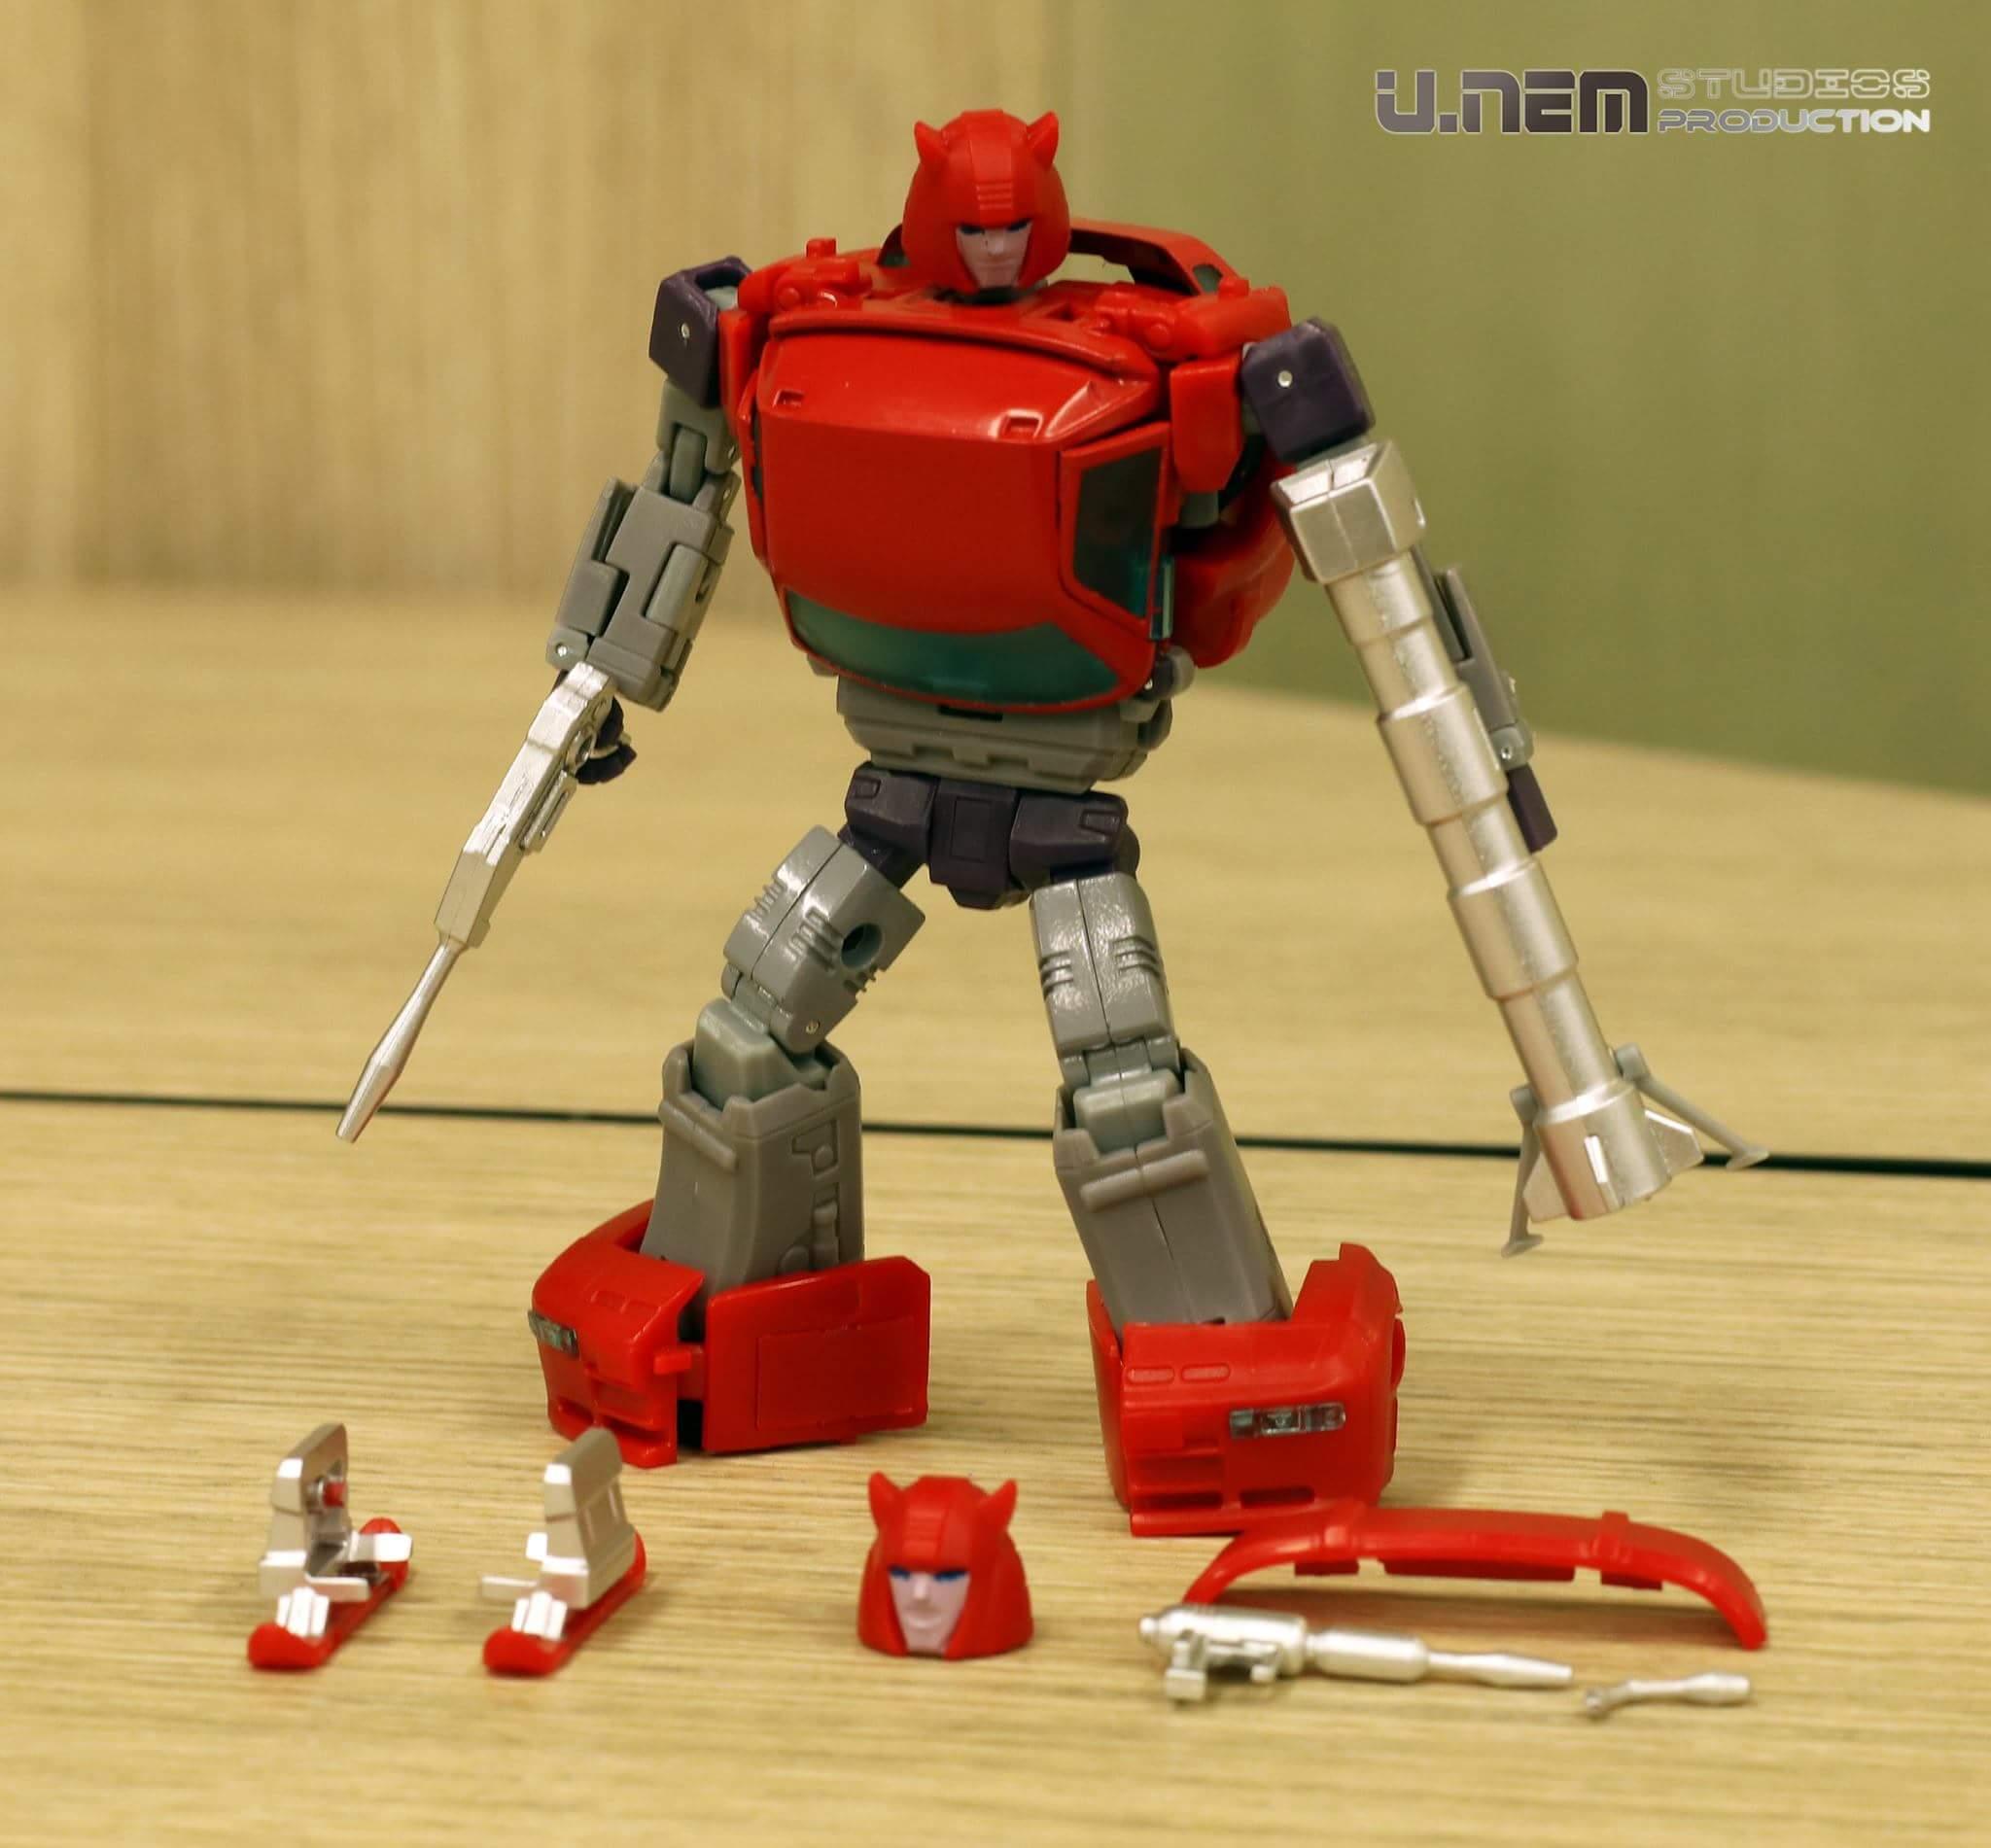 [Ocular Max] Produit Tiers - Minibots MP - PS-09 Hellion (aka Cliffjumper/Matamore), PS-11 Omne - (aka Cosmos) 1KURQhnN_o